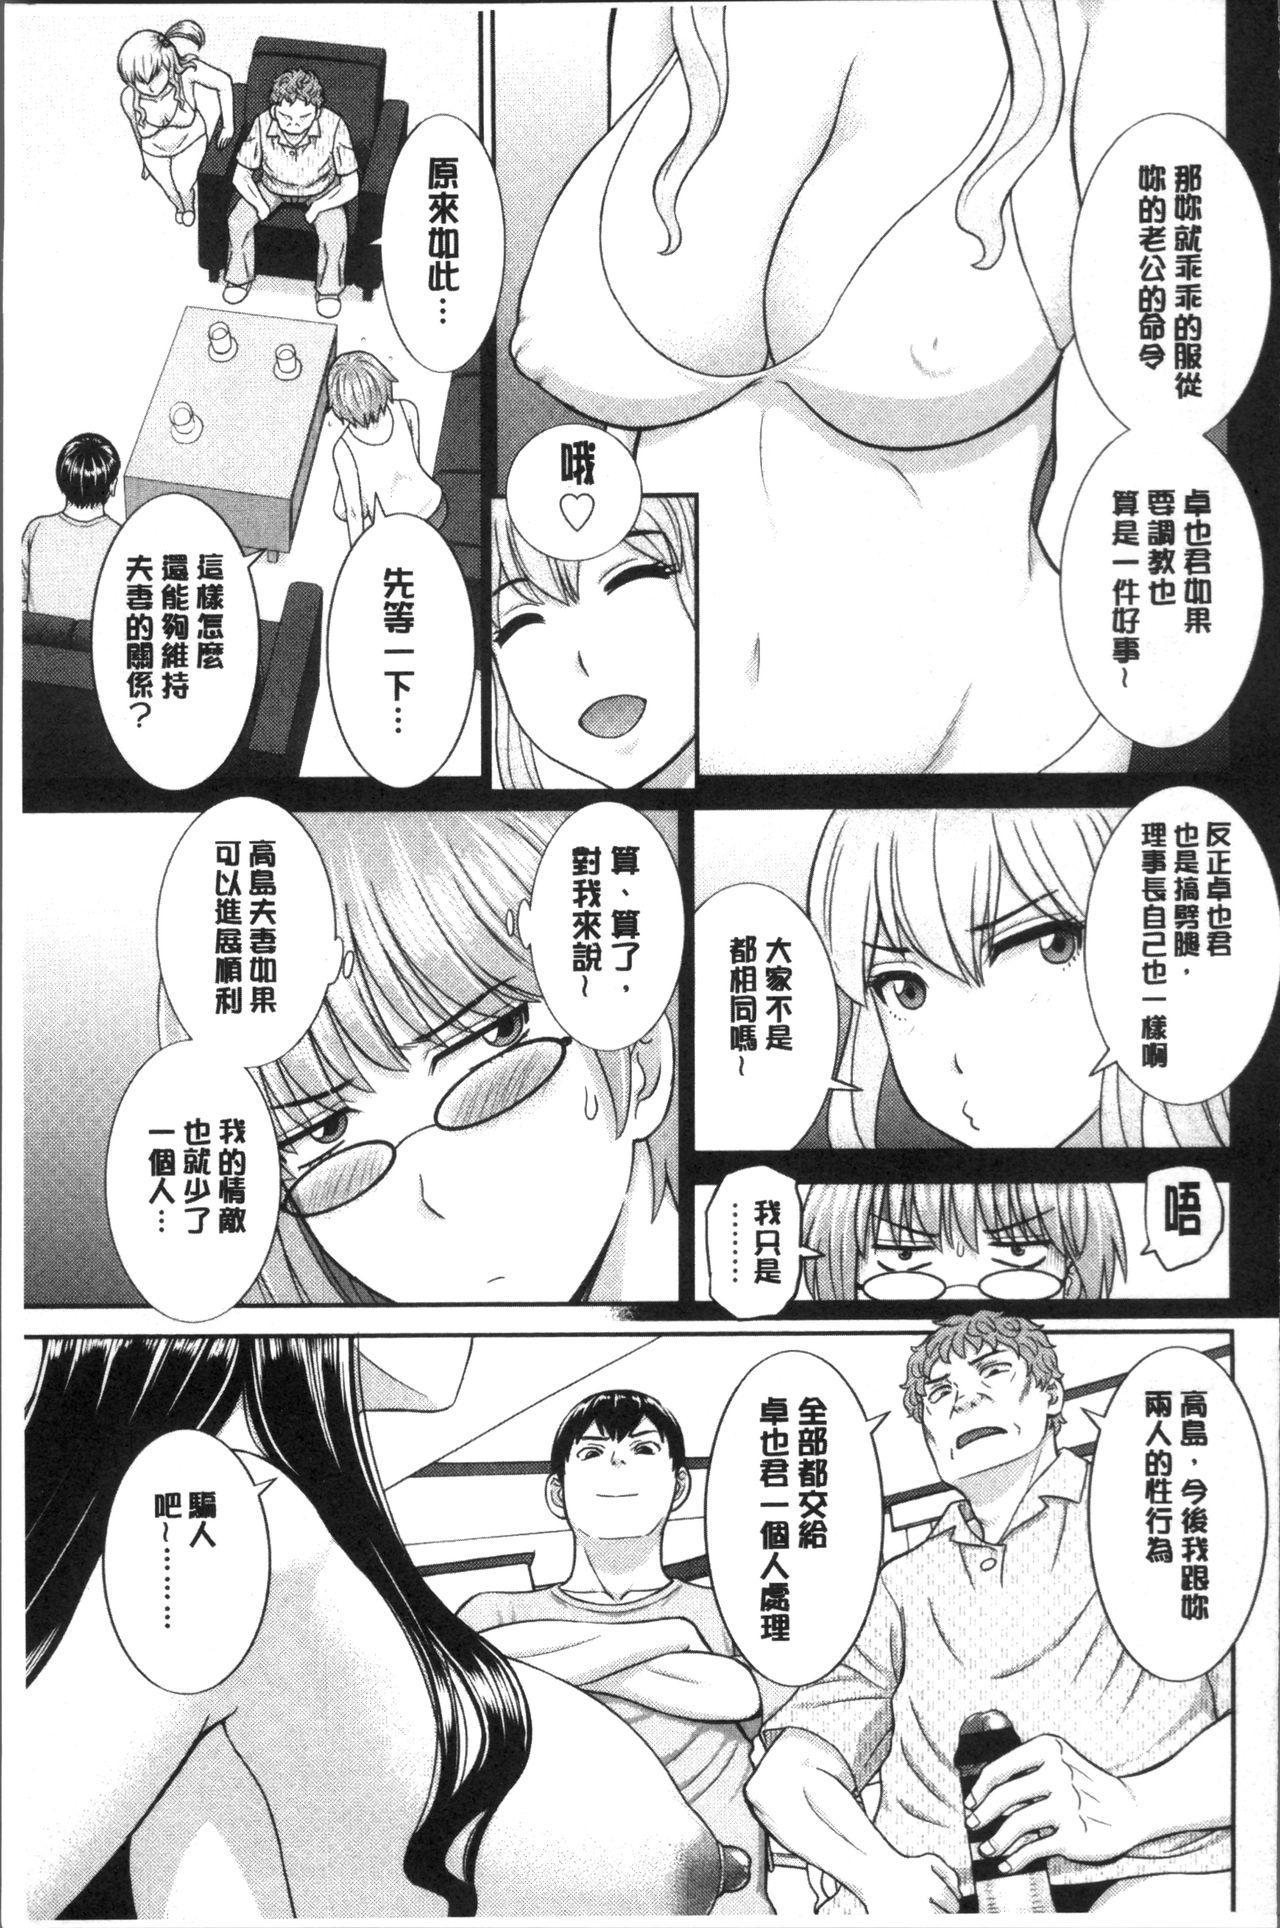 [Kawamori Misaki] Innyuu Shufu no Futei Ganbou - Oku-san to Kanojo to 2 | 淫乳主婦的不貞願望 和人妻也和女友❤2 [Chinese] 158